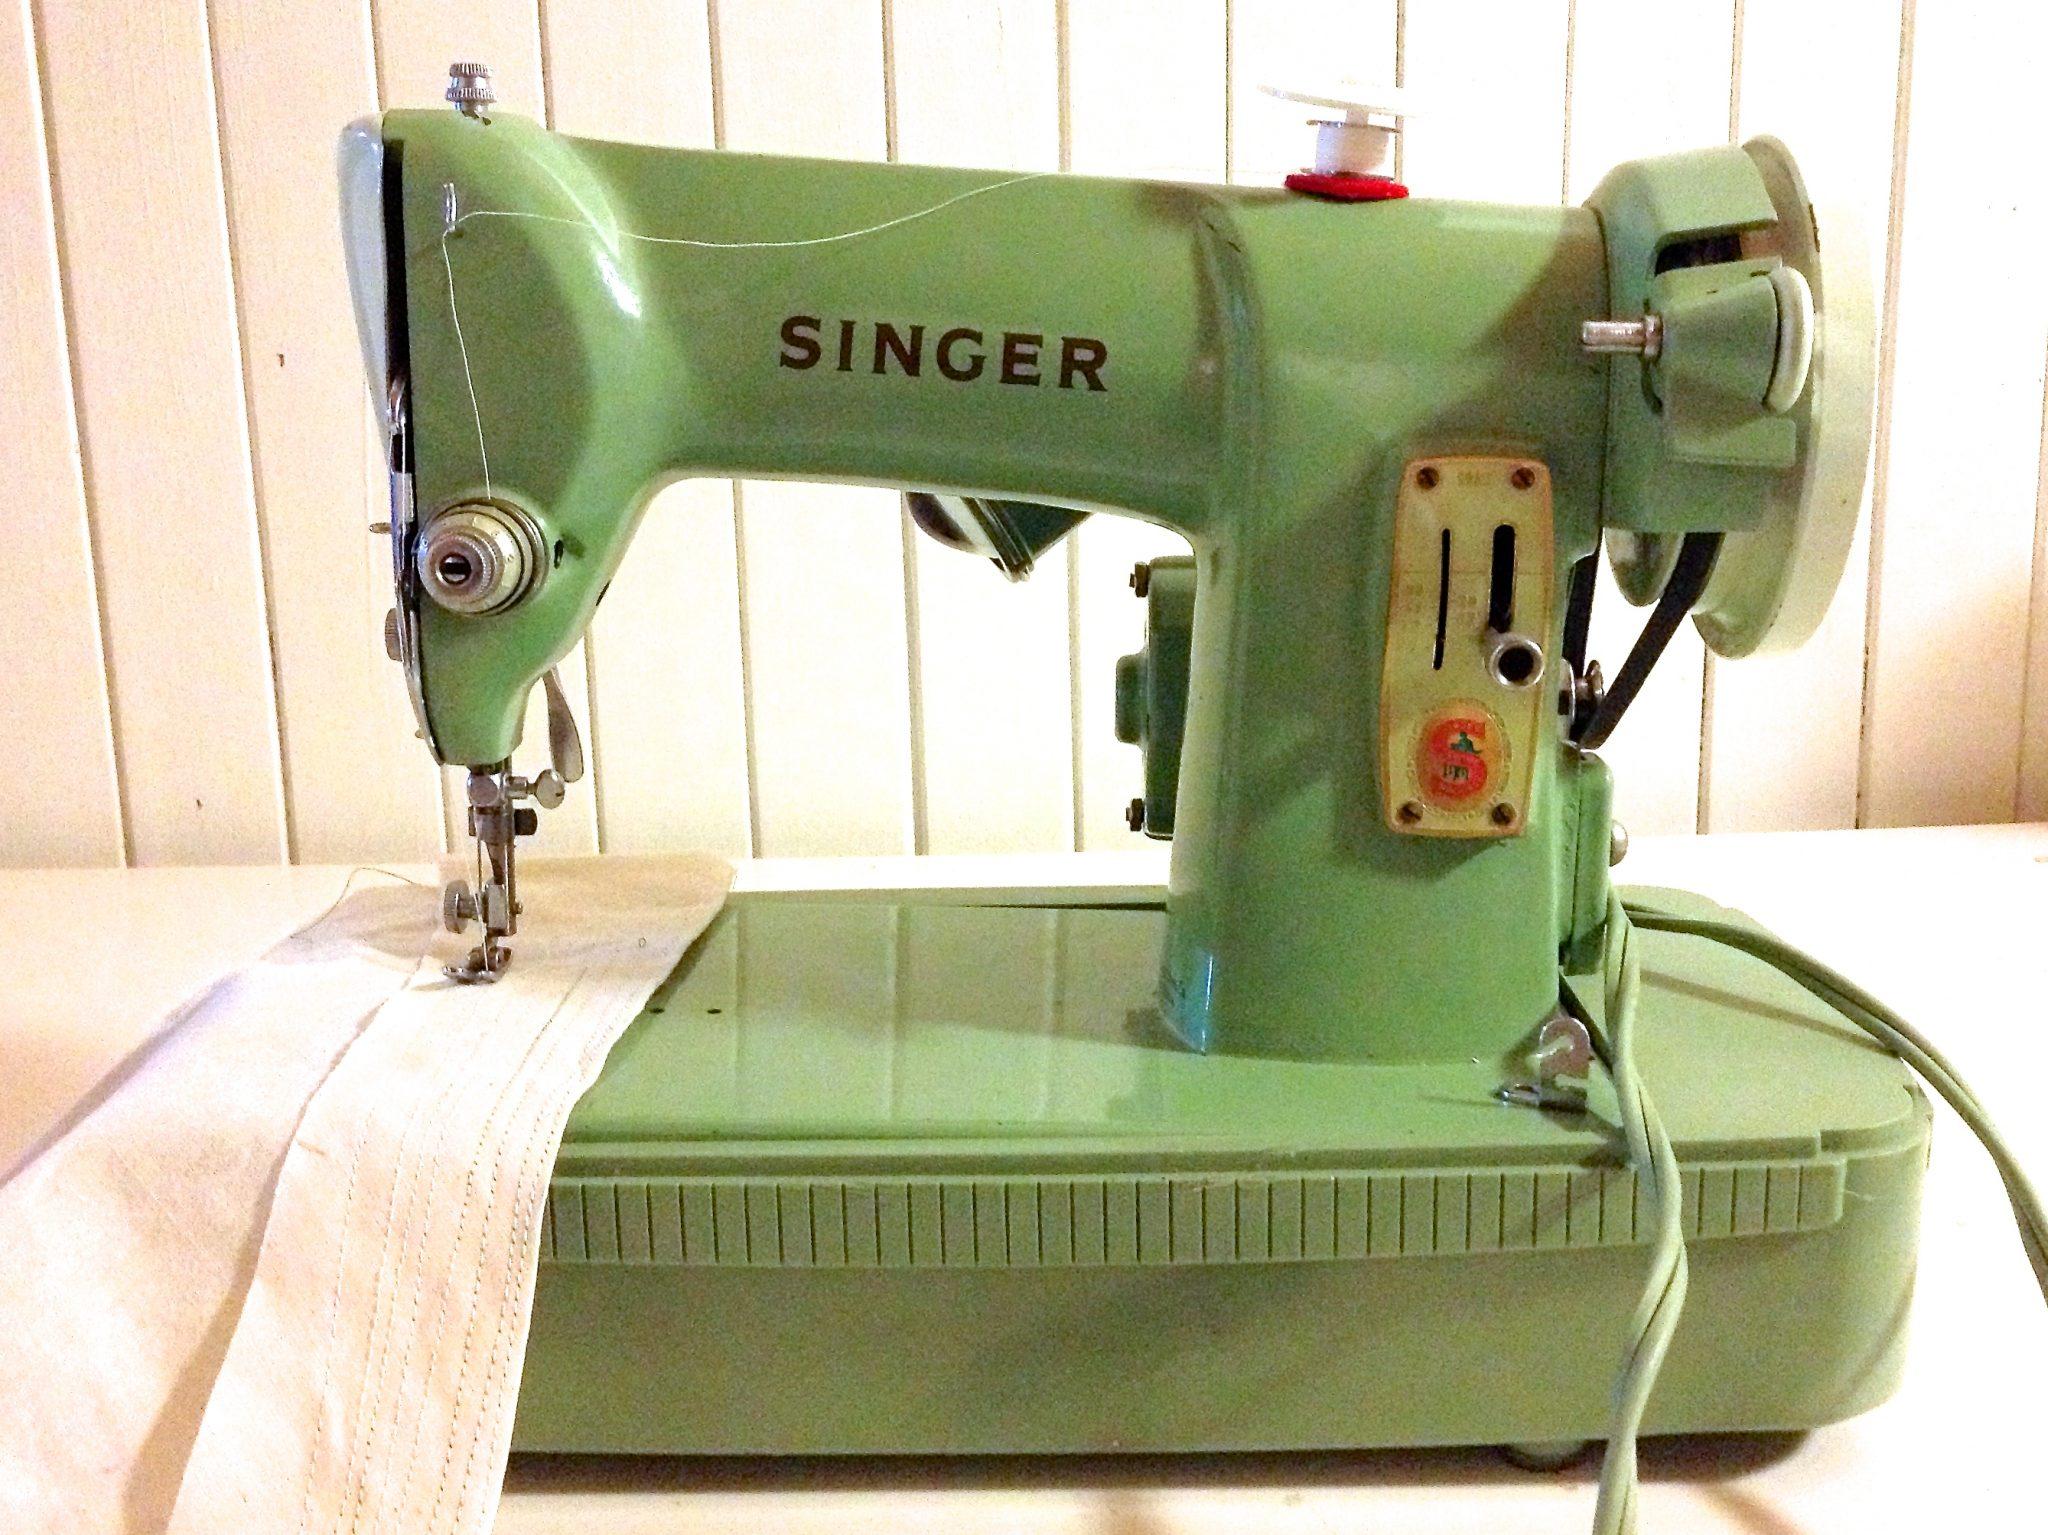 singer hd sewing machine